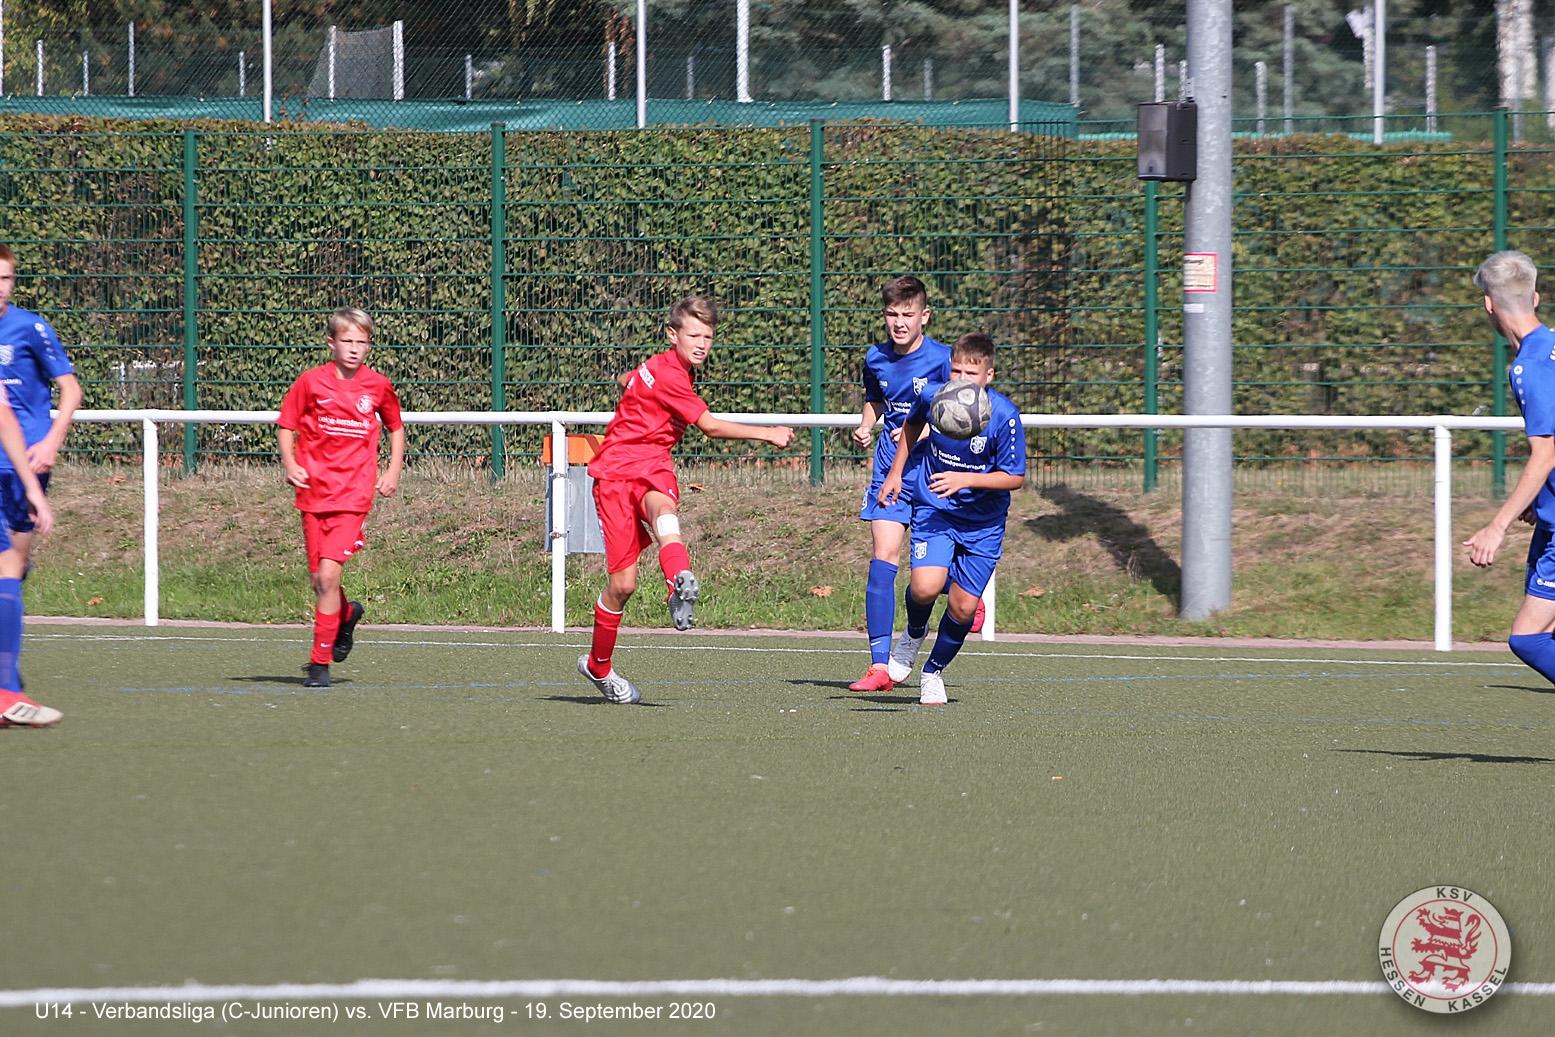 U14 - VfB Marburg